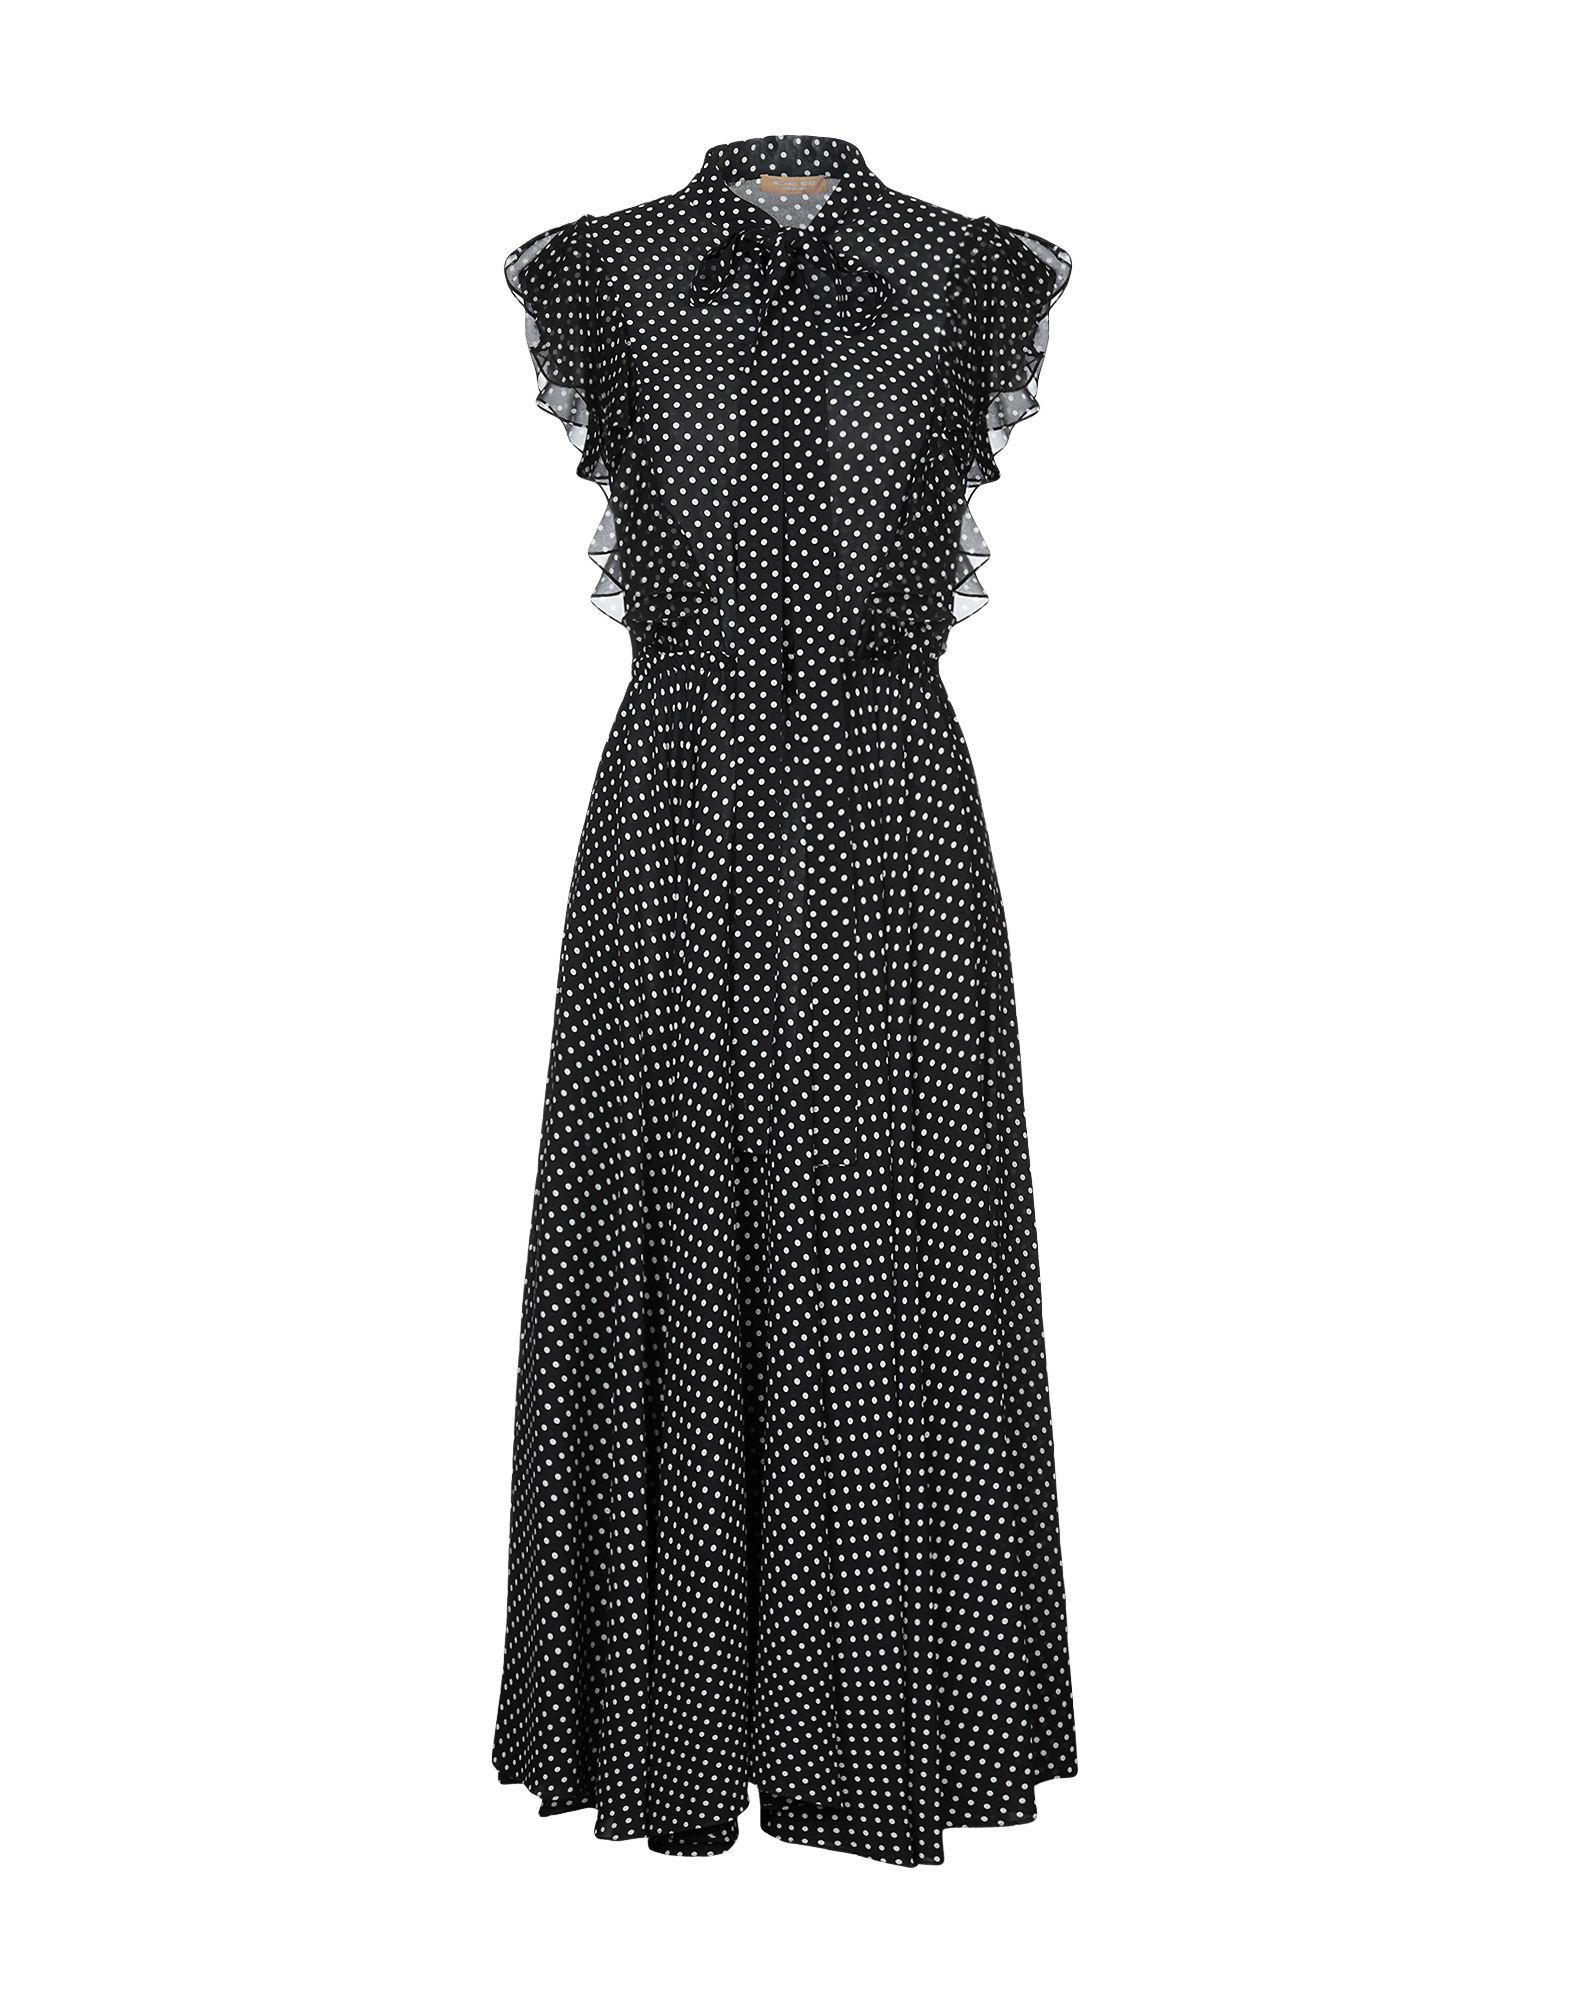 Фото - MICHAEL KORS COLLECTION Длинное платье michael kors collection майка